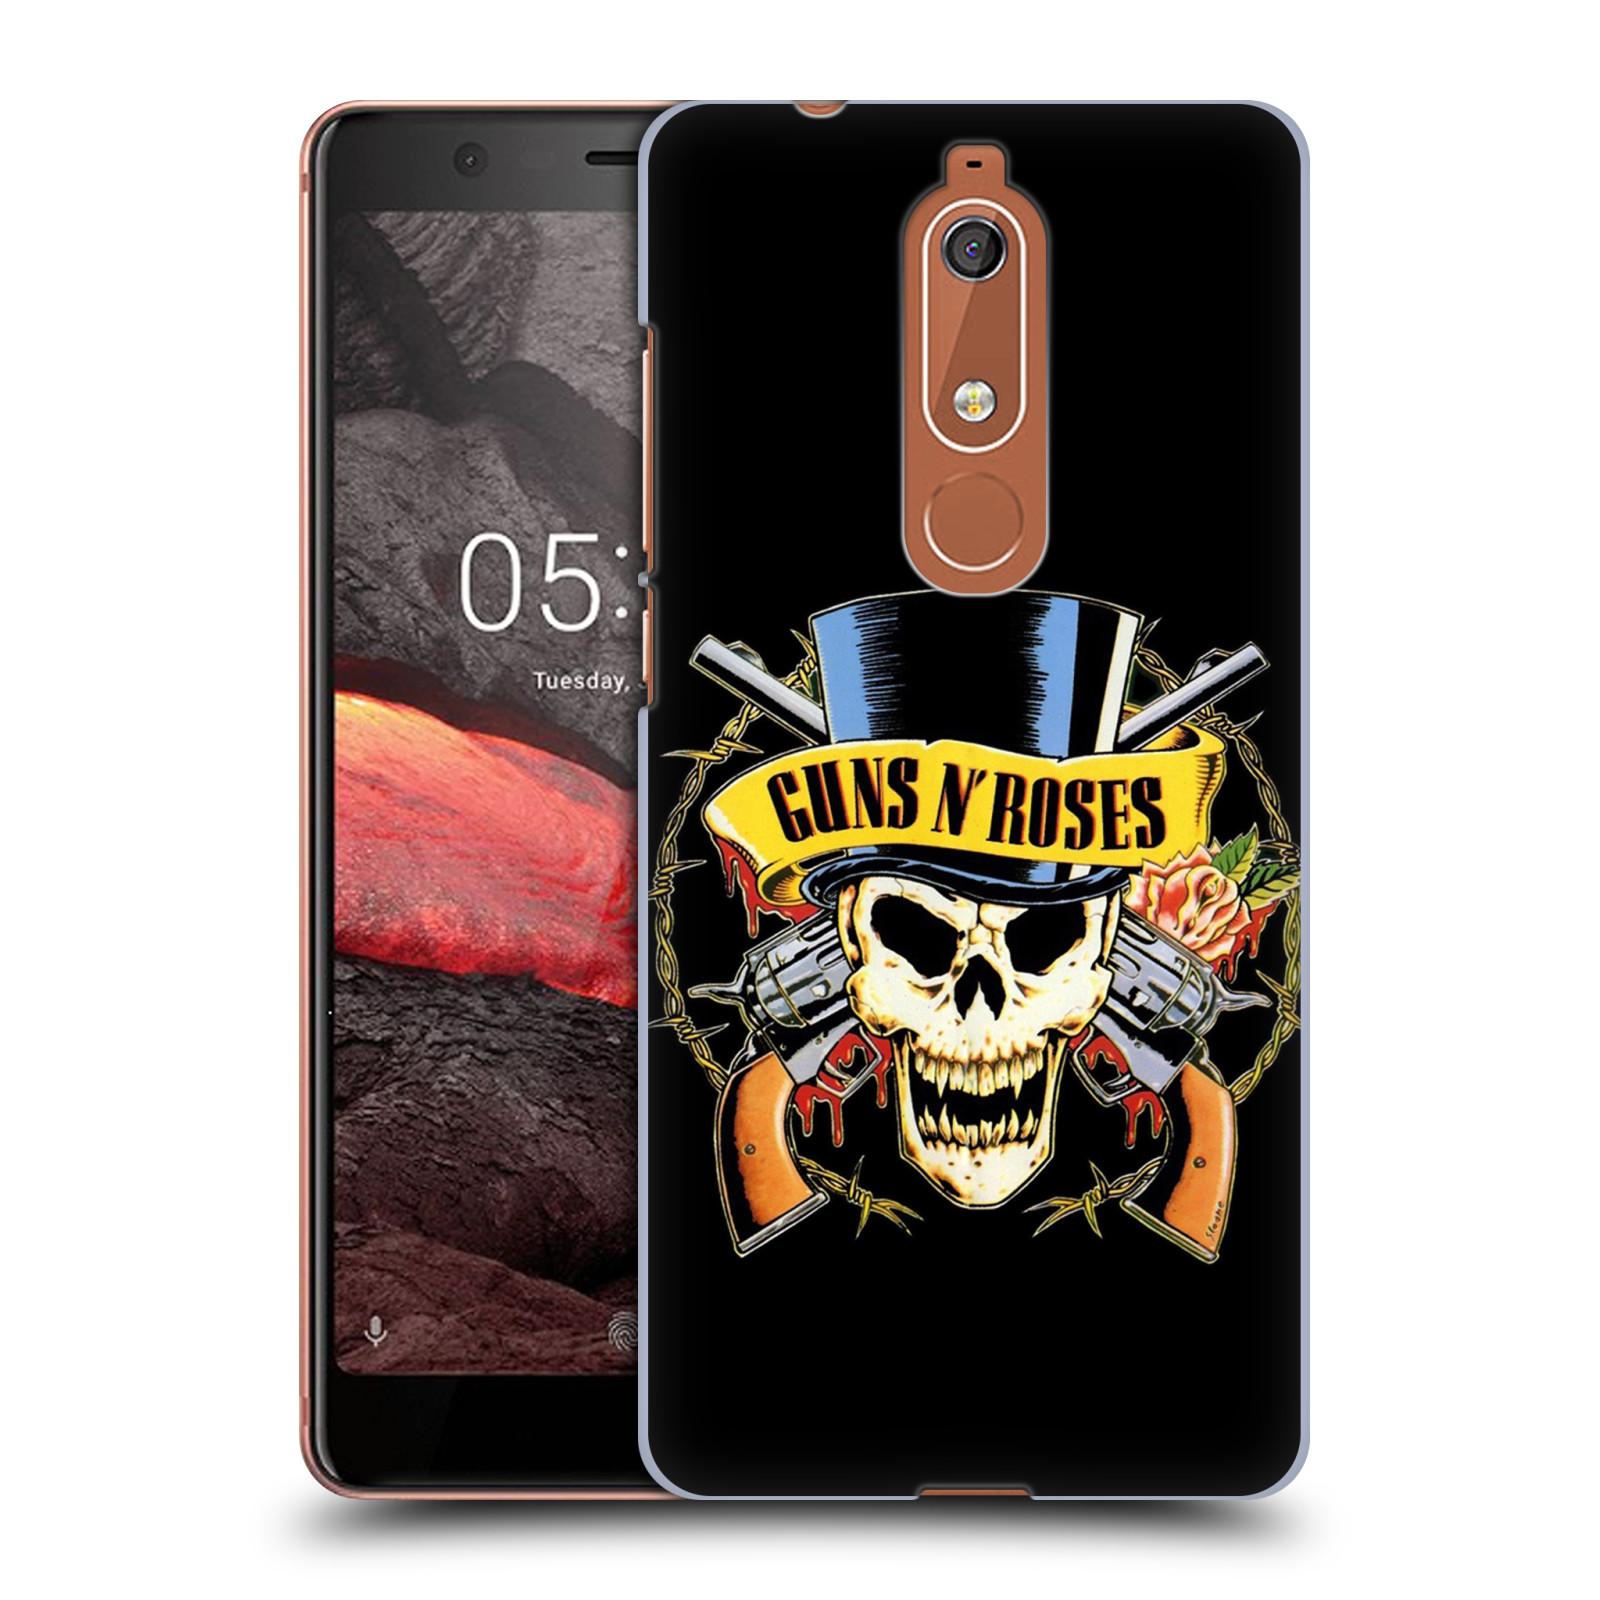 Plastové pouzdro na mobil Nokia 5.1 - Head Case - Guns N' Roses - Lebka